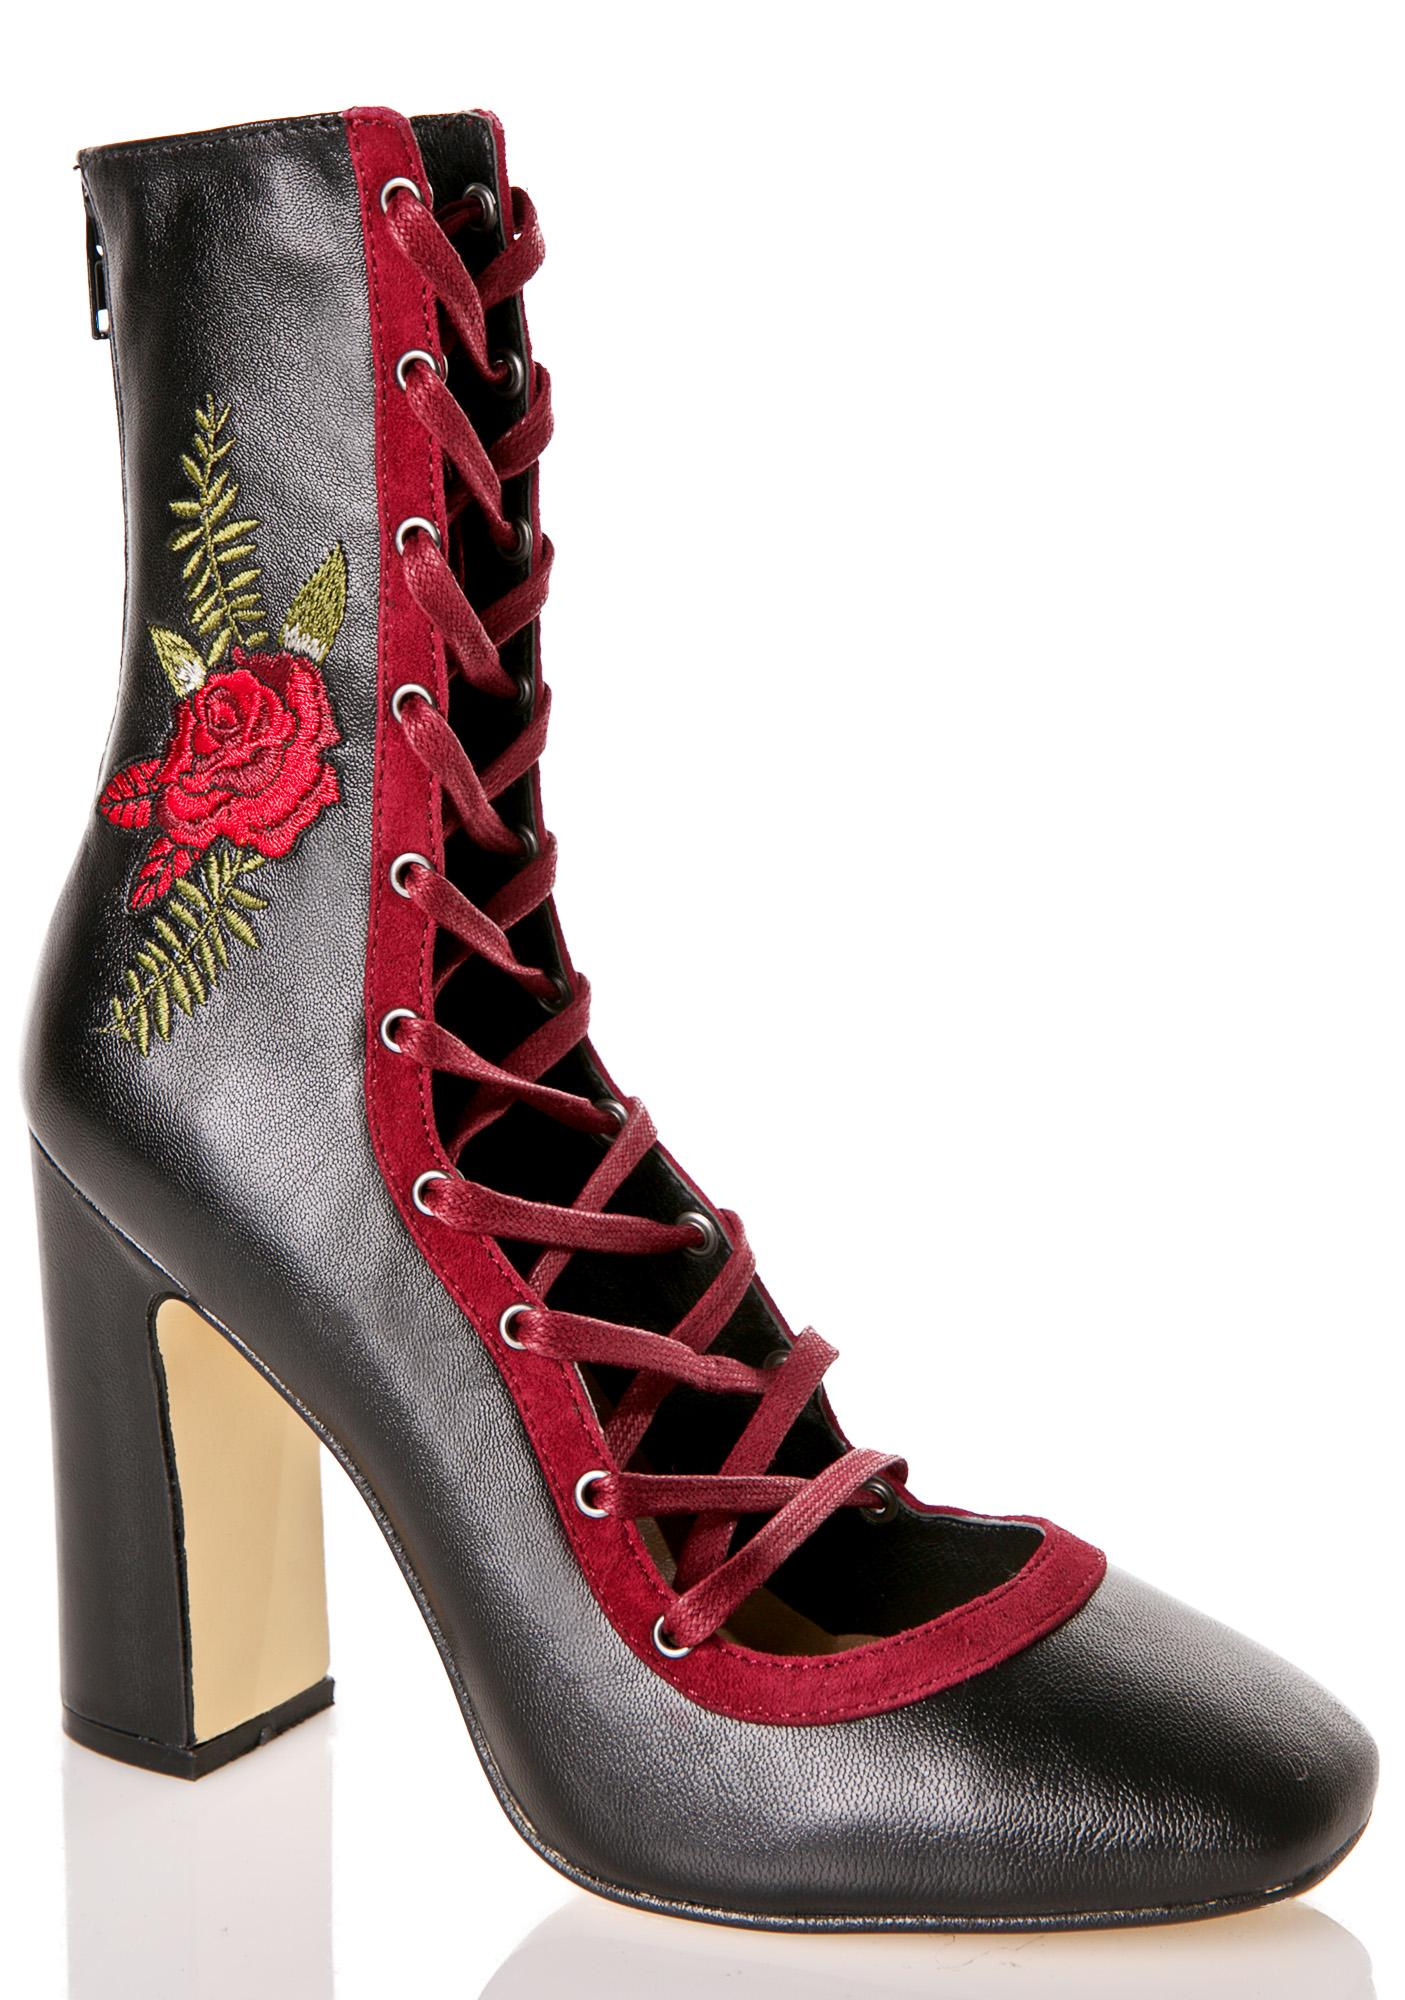 Chinese Laundry Black Rose Leather Heels